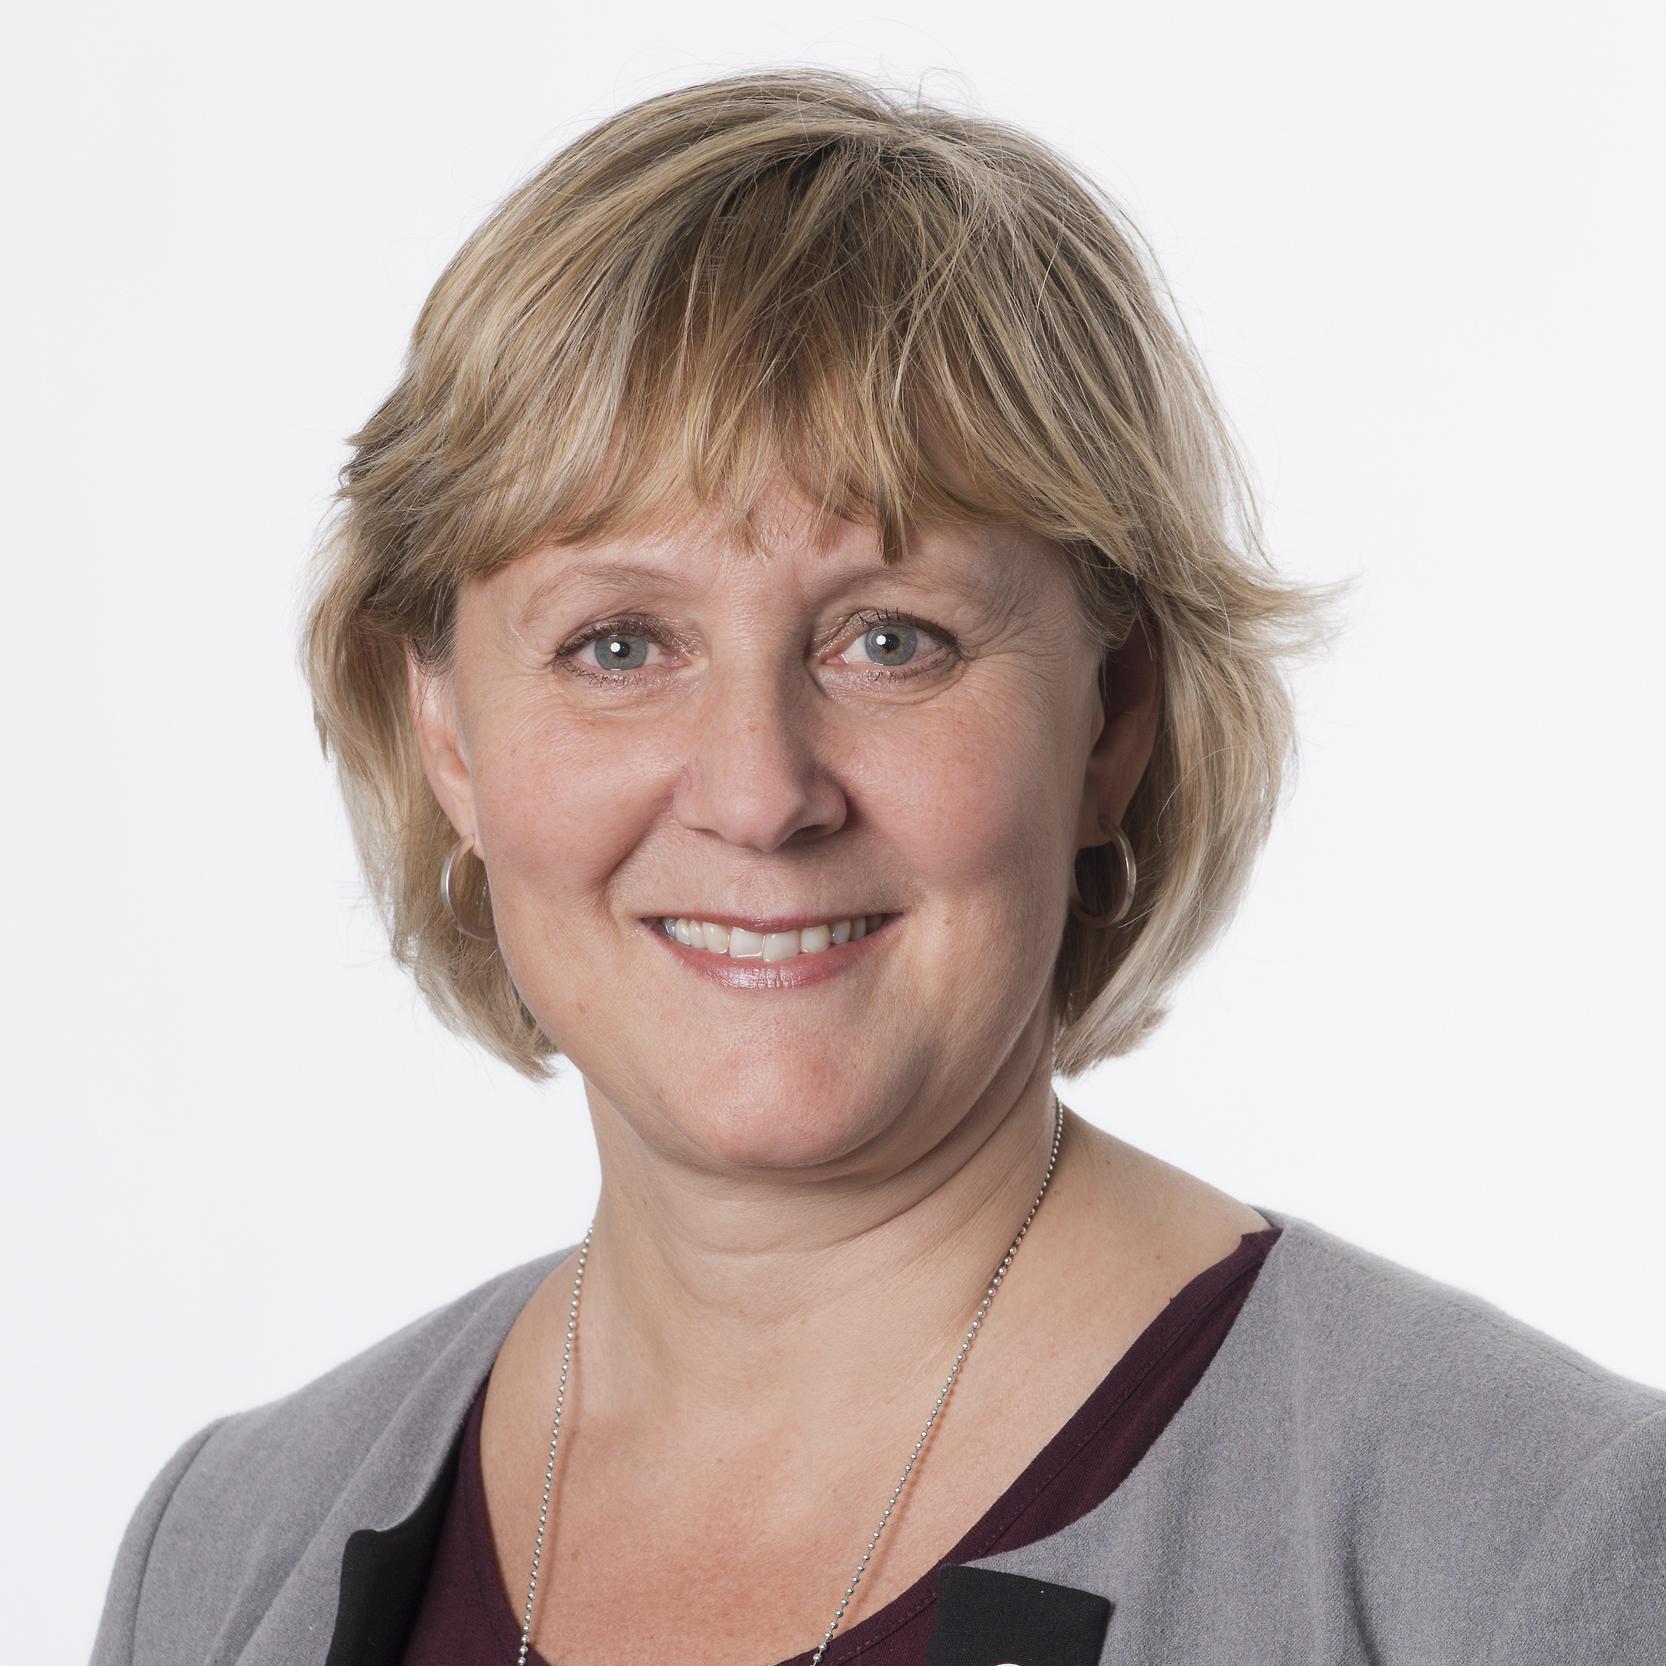 Charlotte Wåhlin